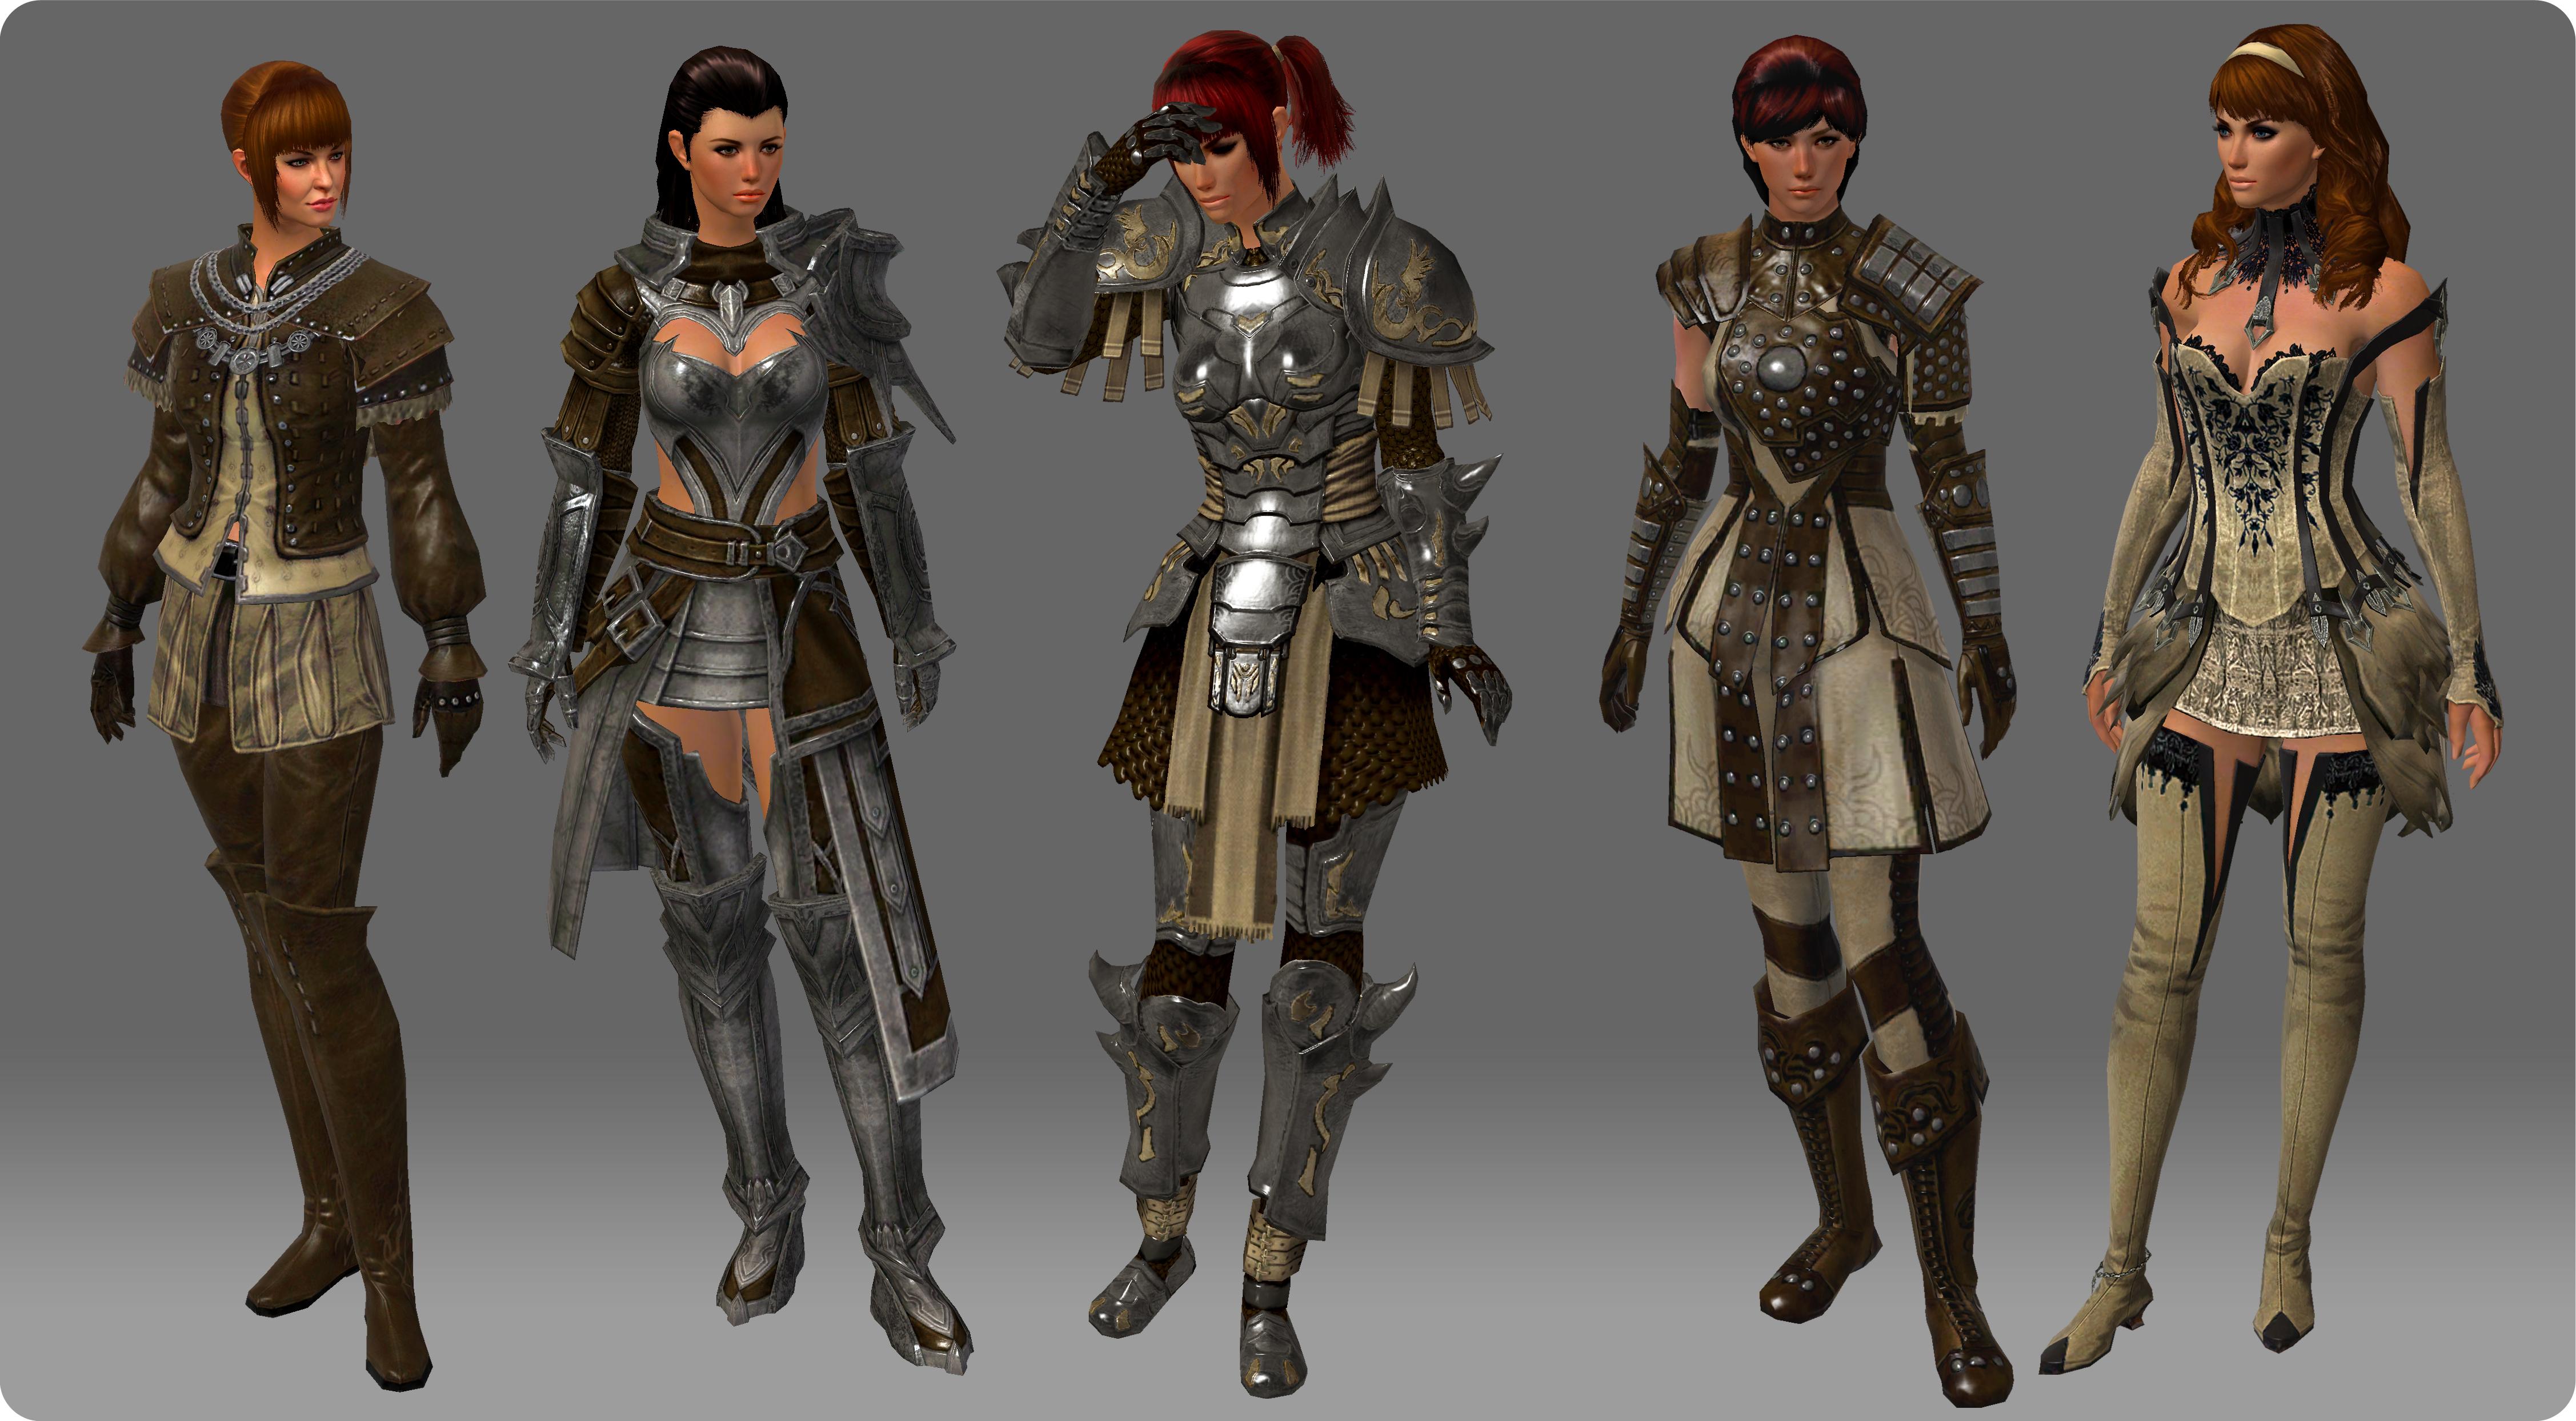 guild wars 2 armor - photo #37